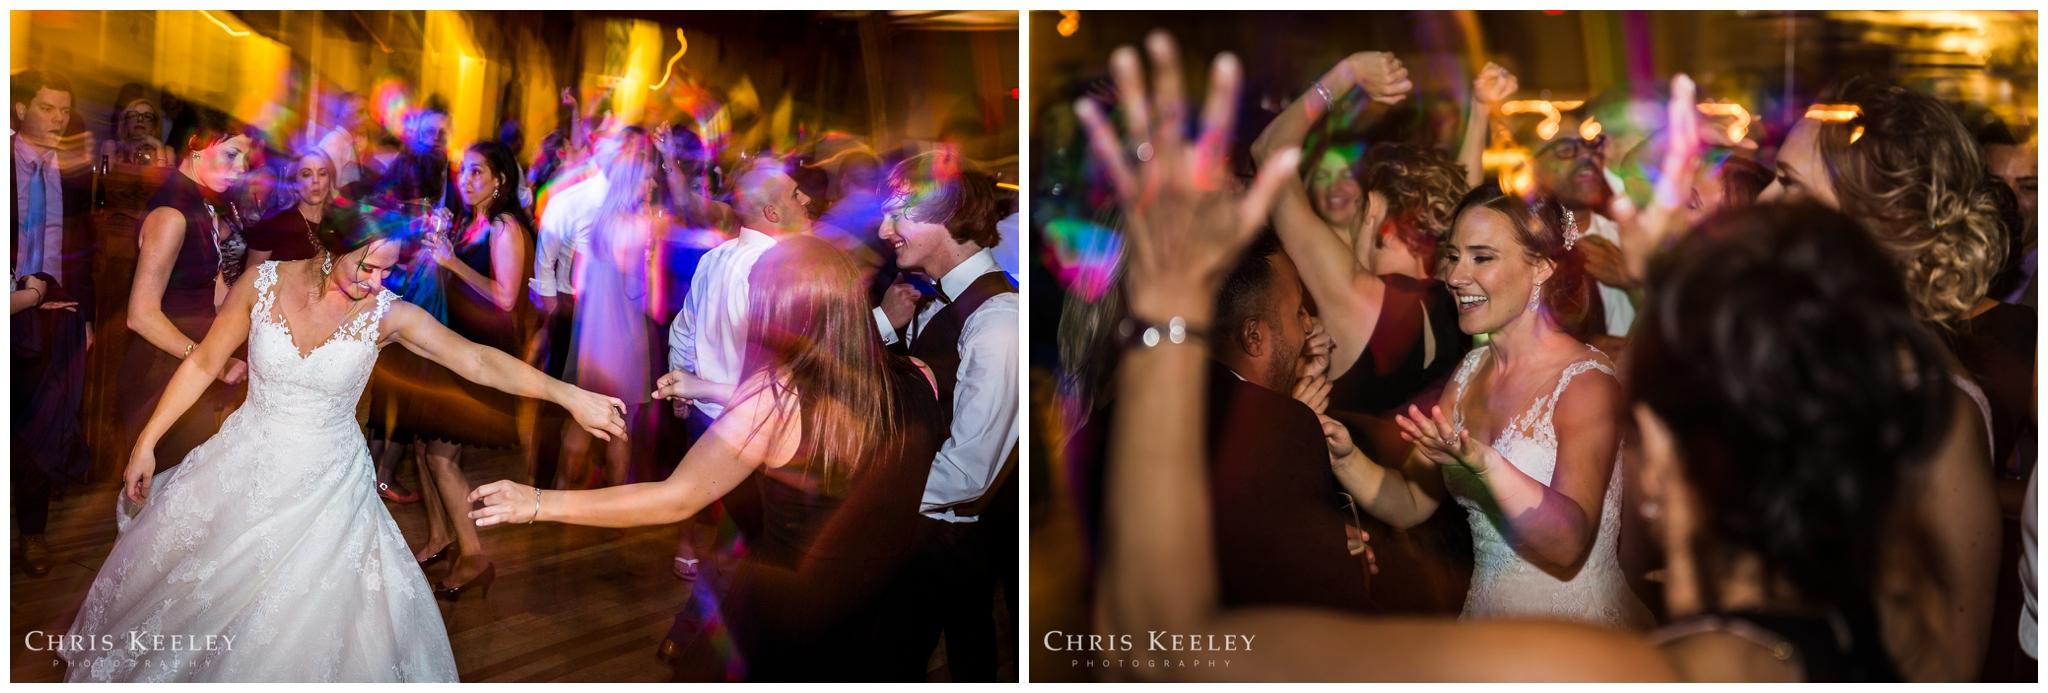 grace-restaurant-portland-maine-wedding-photographer-chris-keeley-71.jpg